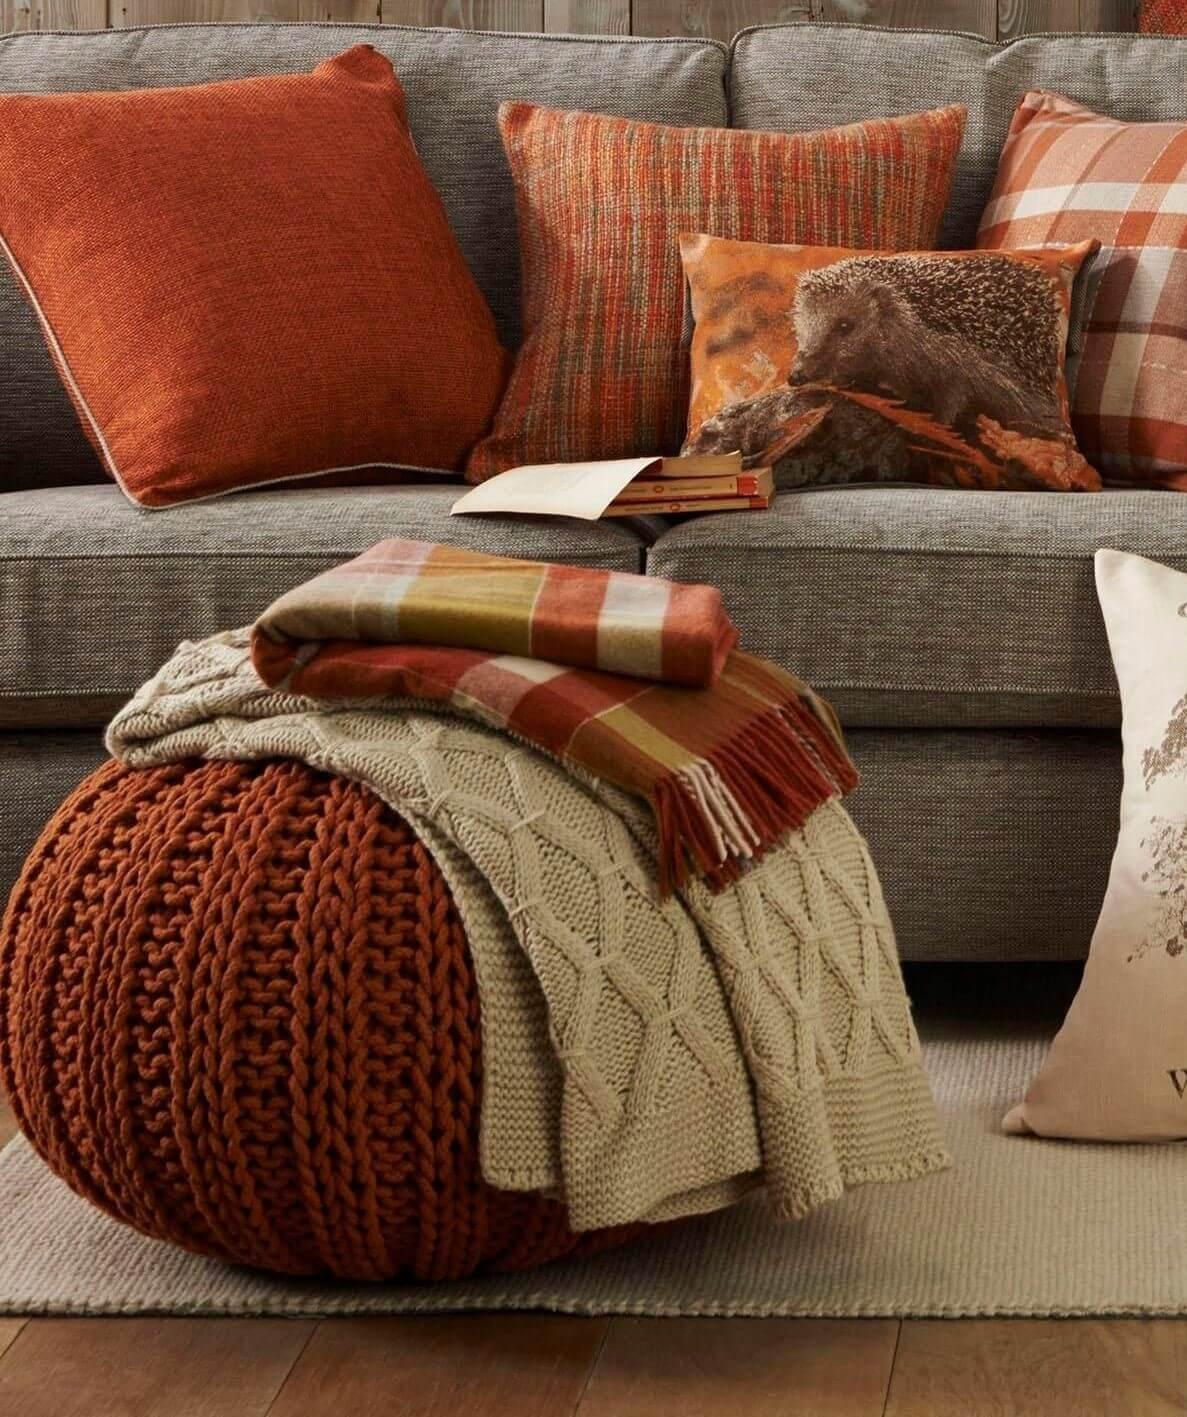 Conservatory Sofa Ideas - Throws & Cushions